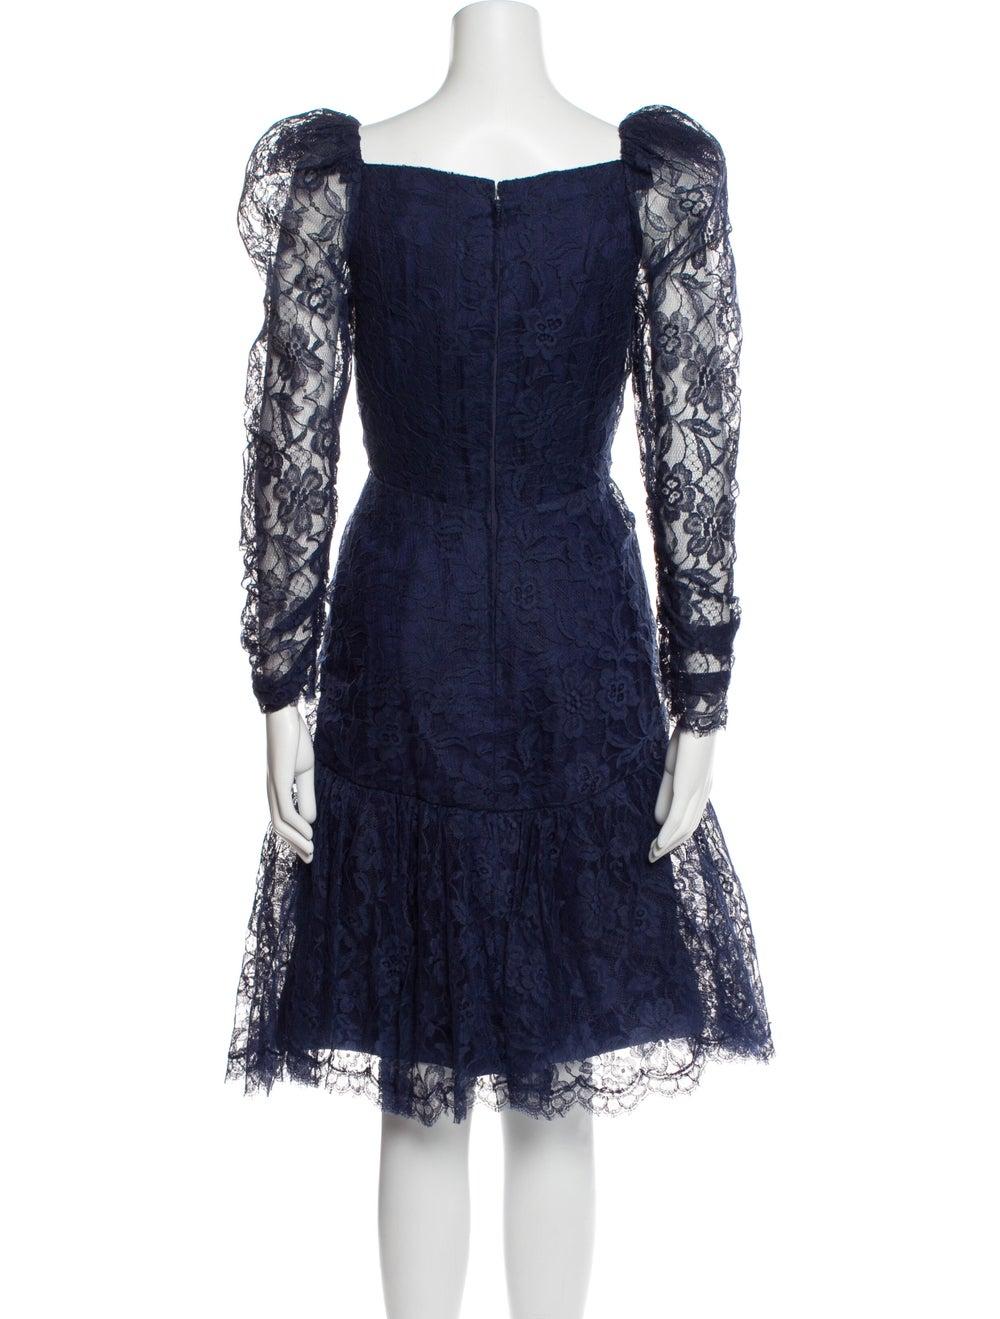 Arnold Scaasi Vintage Knee-Length Dress Blue - image 3